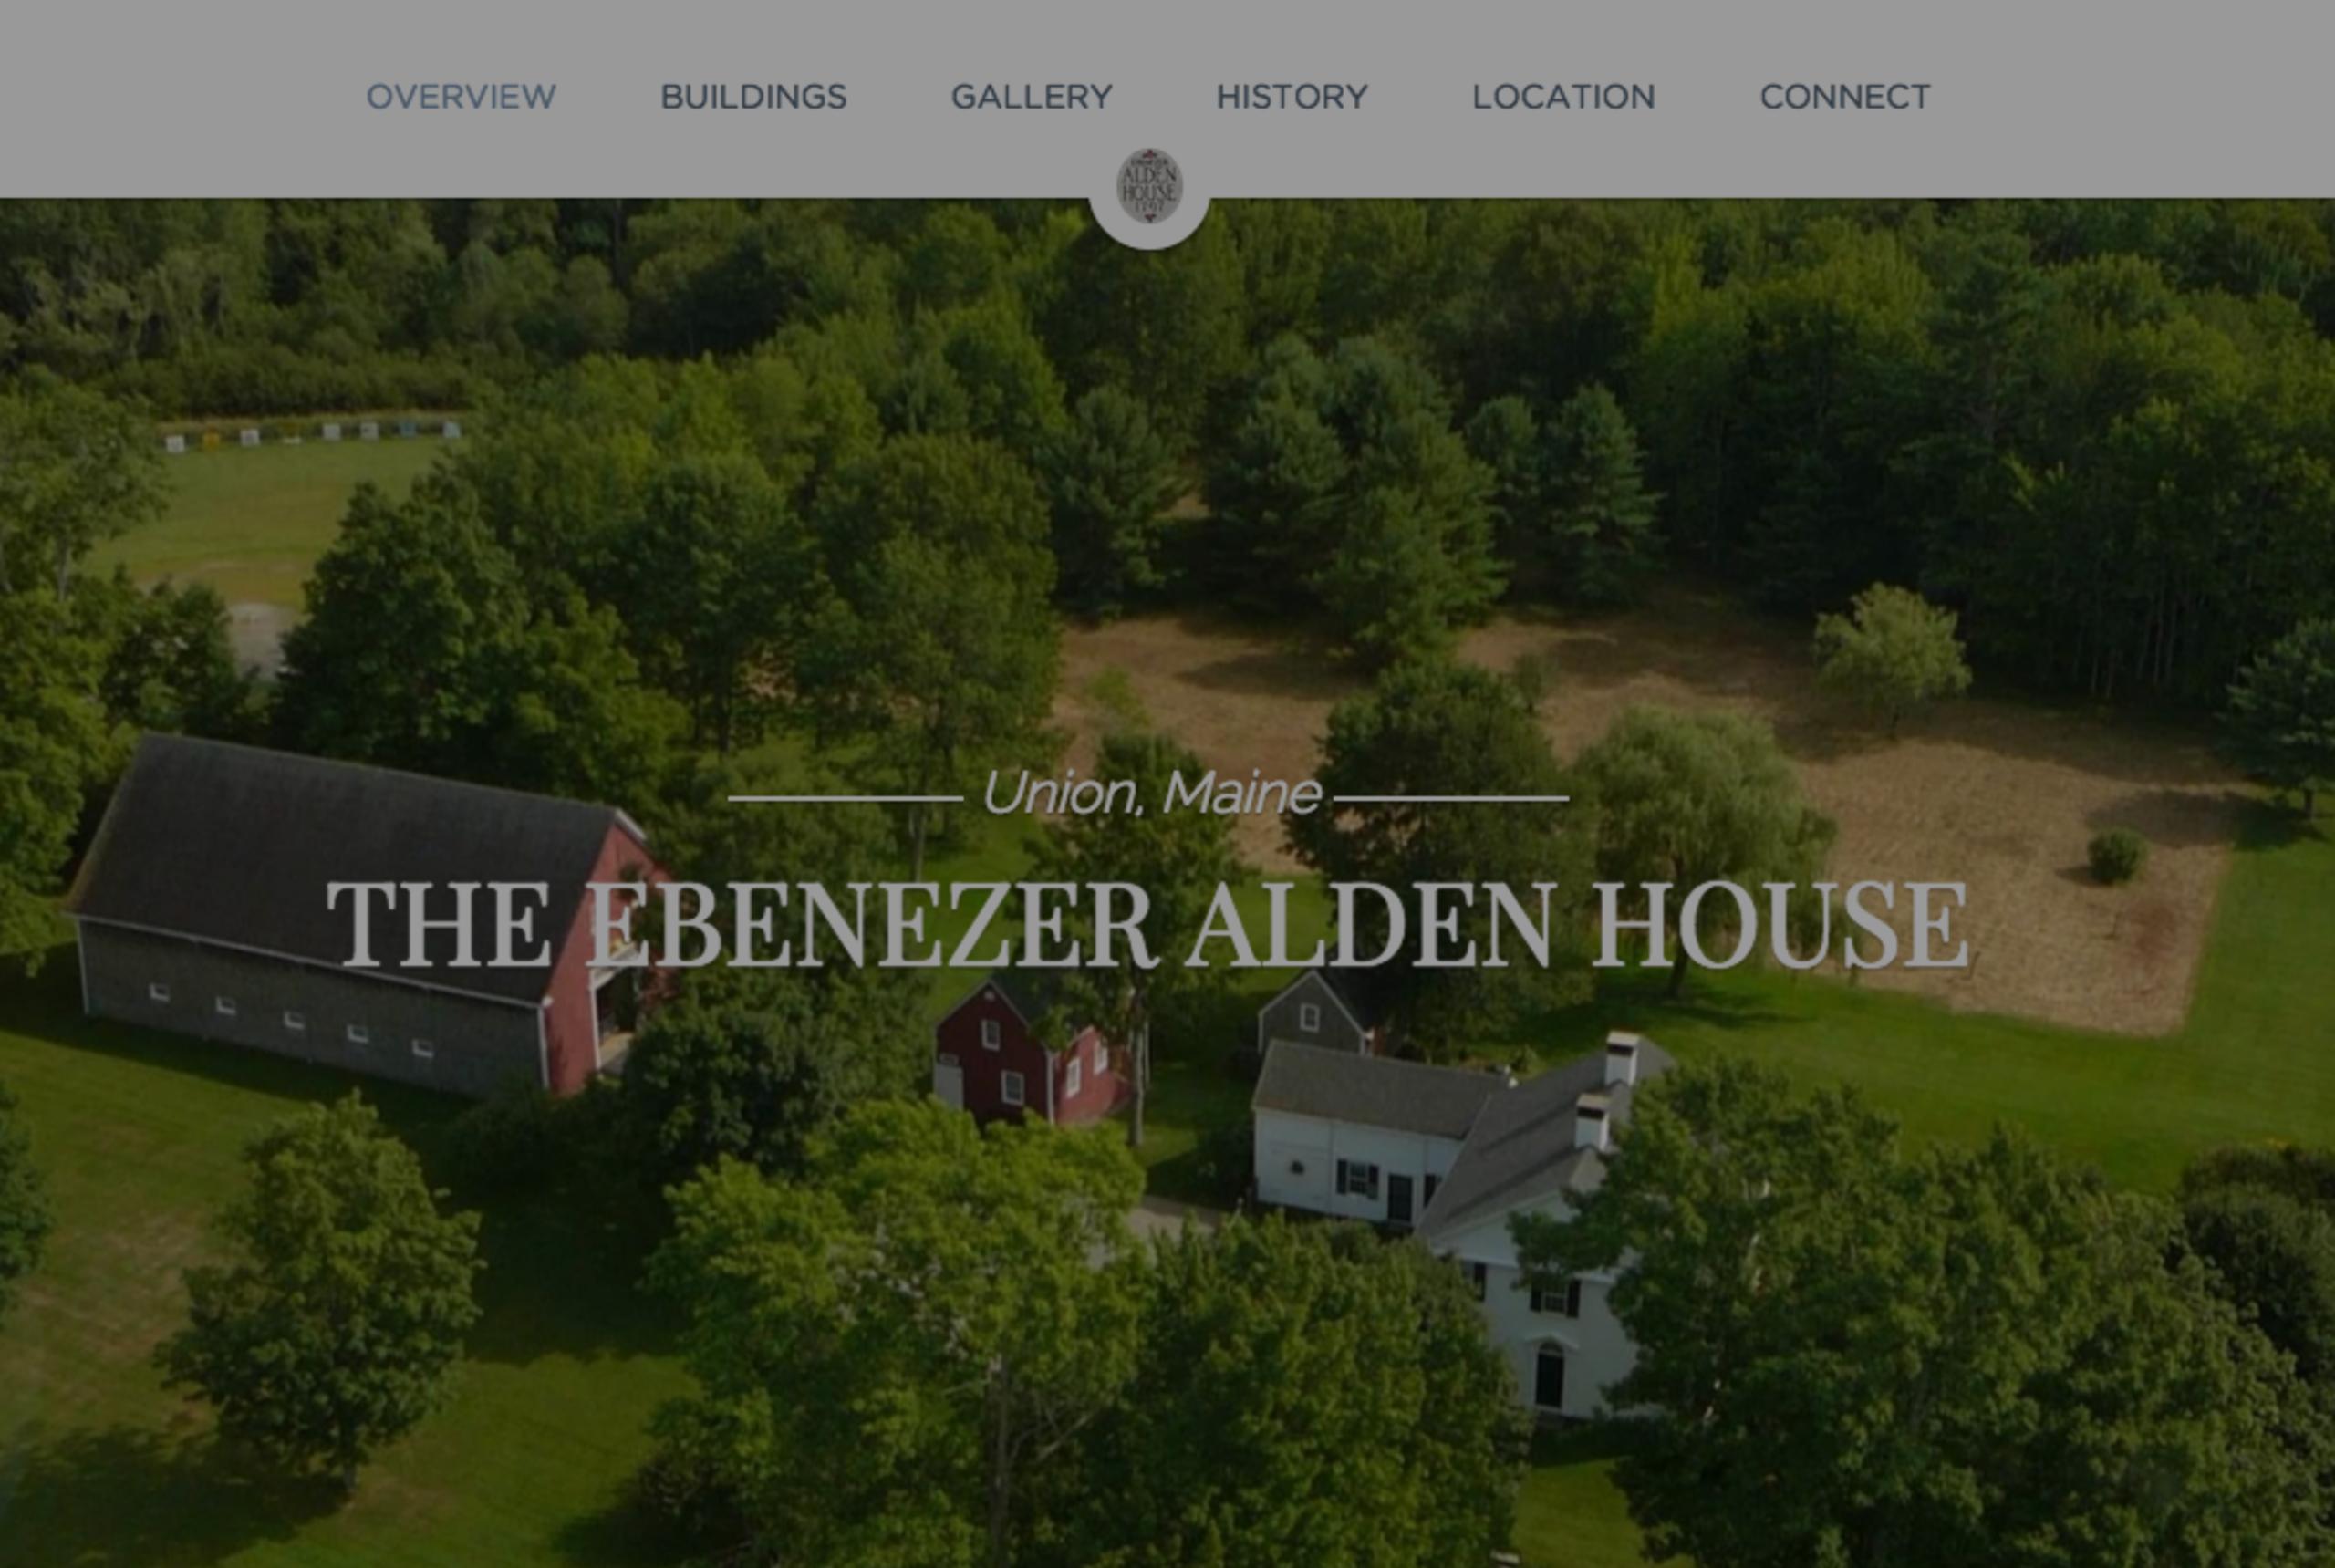 New Property Website Released: EbenezerAldenHouse.com